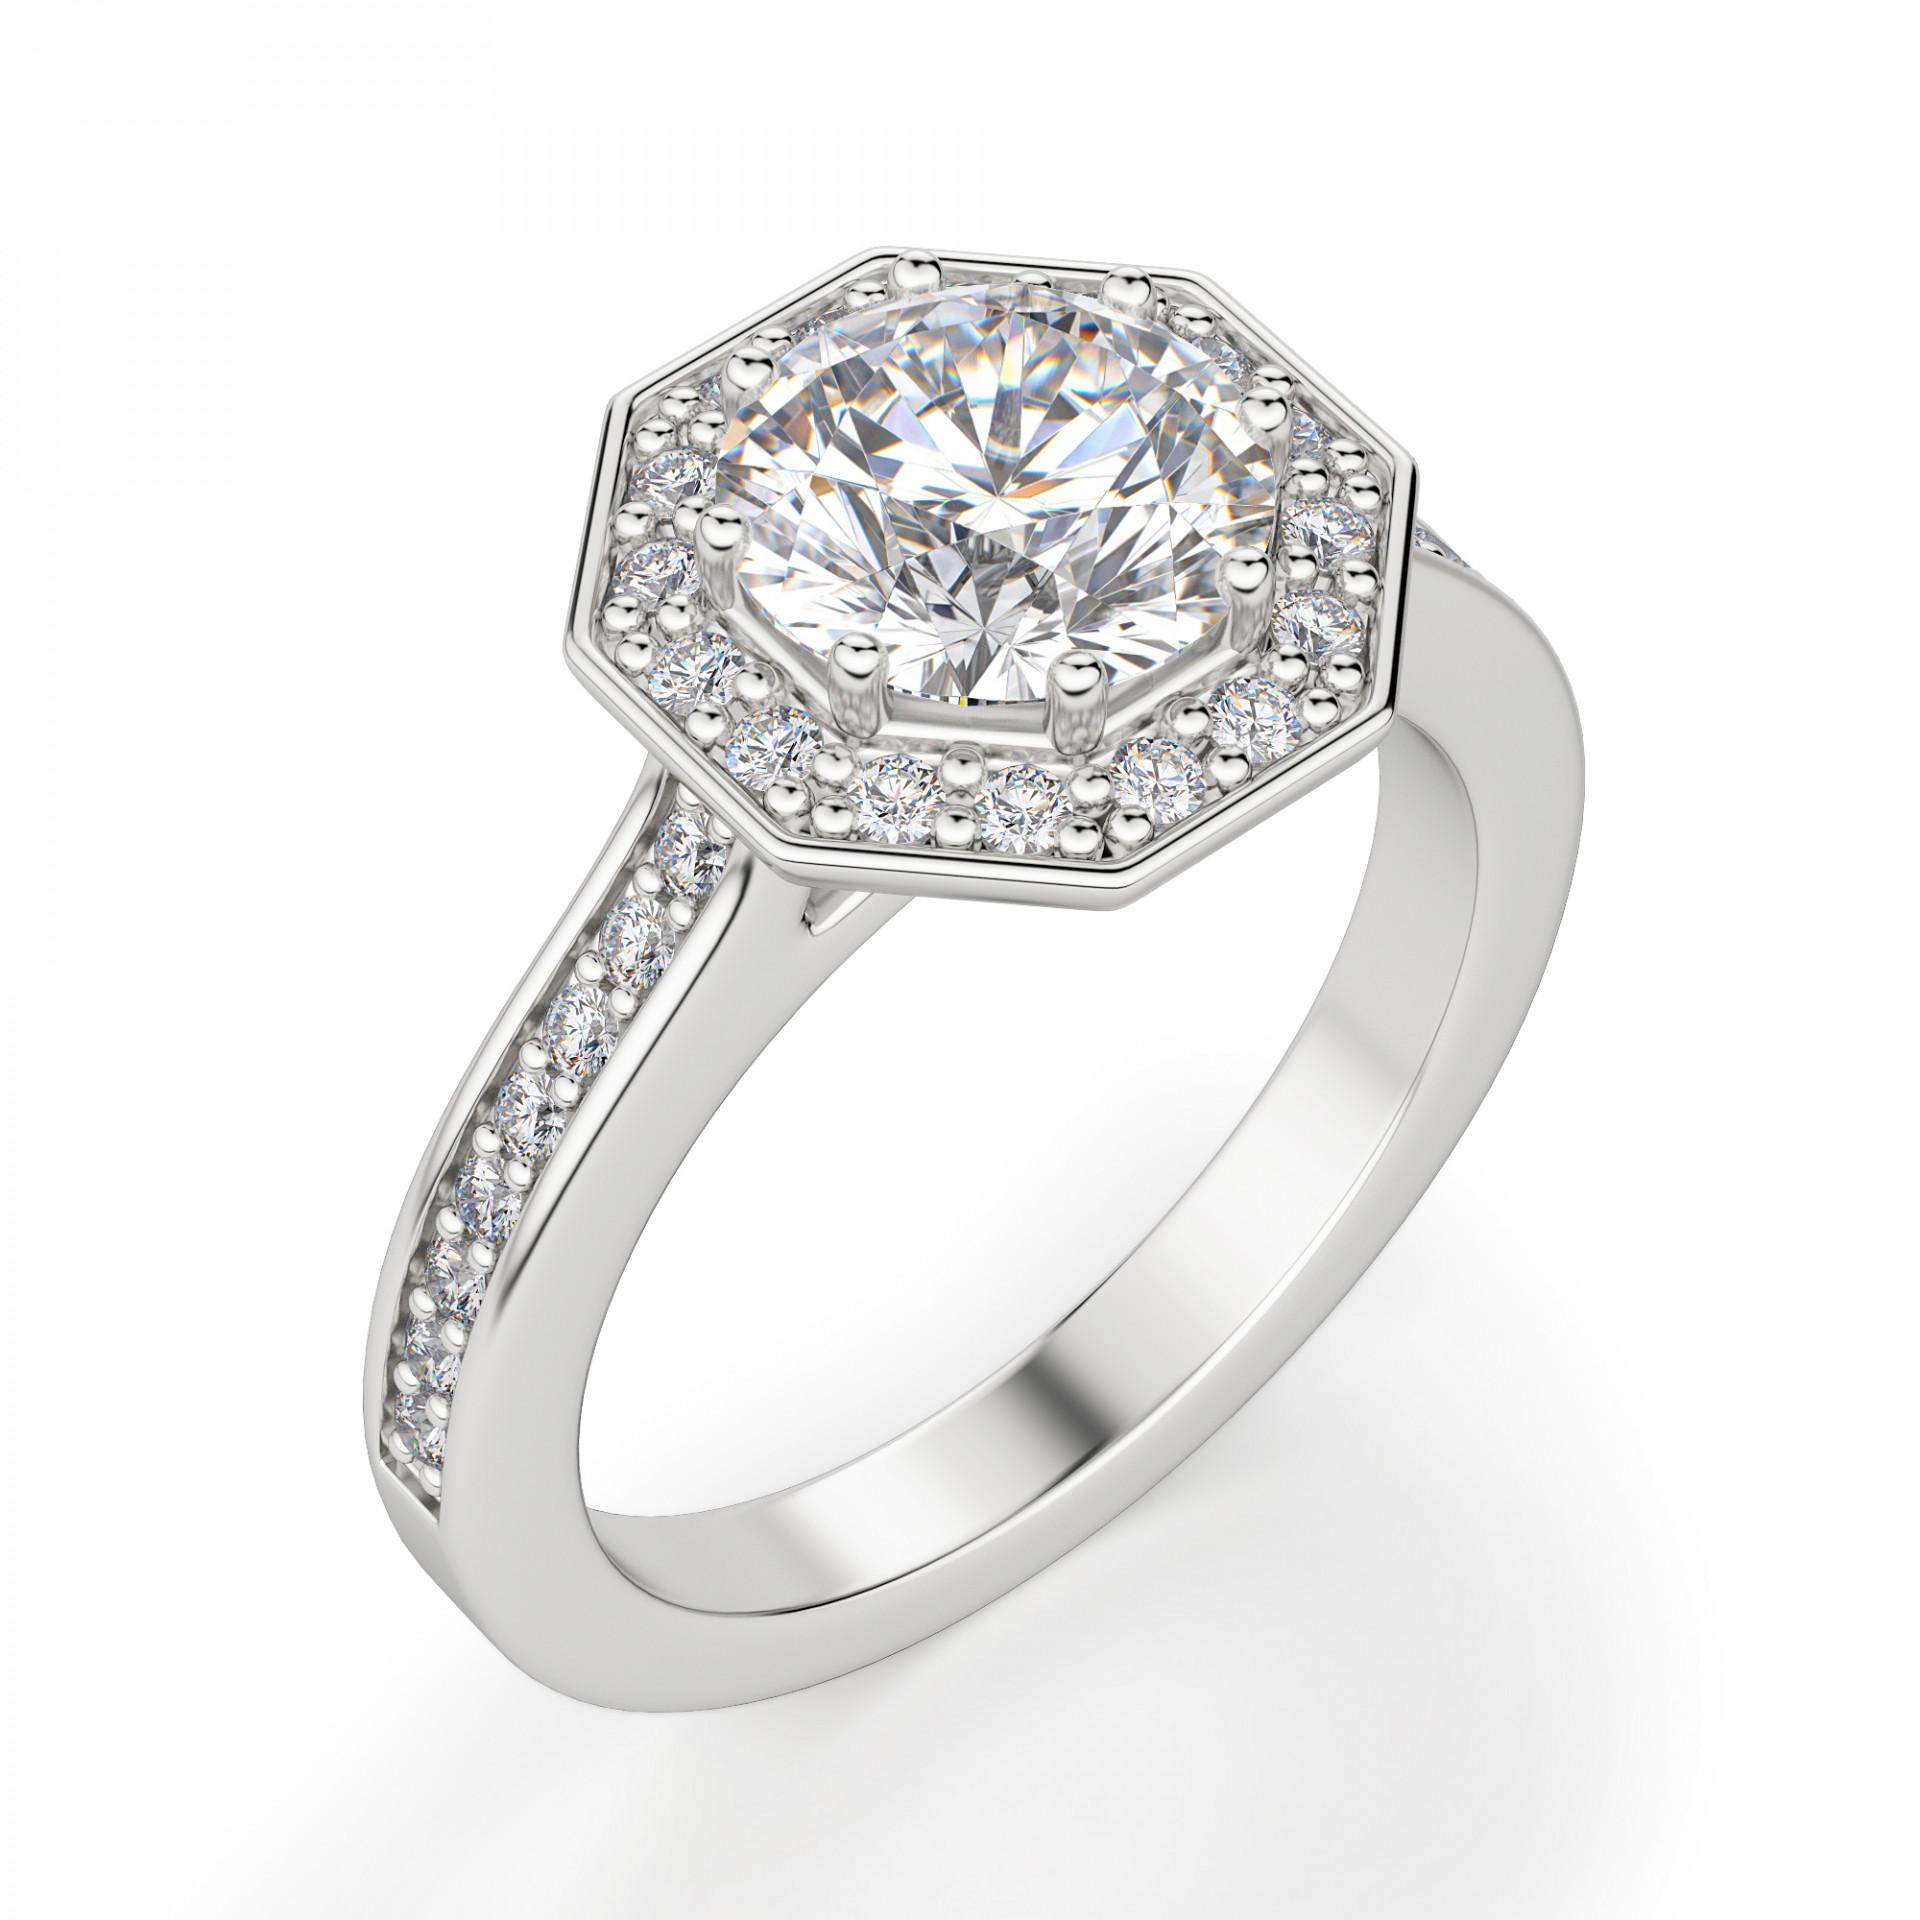 61f3bdfcd5de Cordoba Round Cut Engagement Ring - Engagement Rings - Engagement